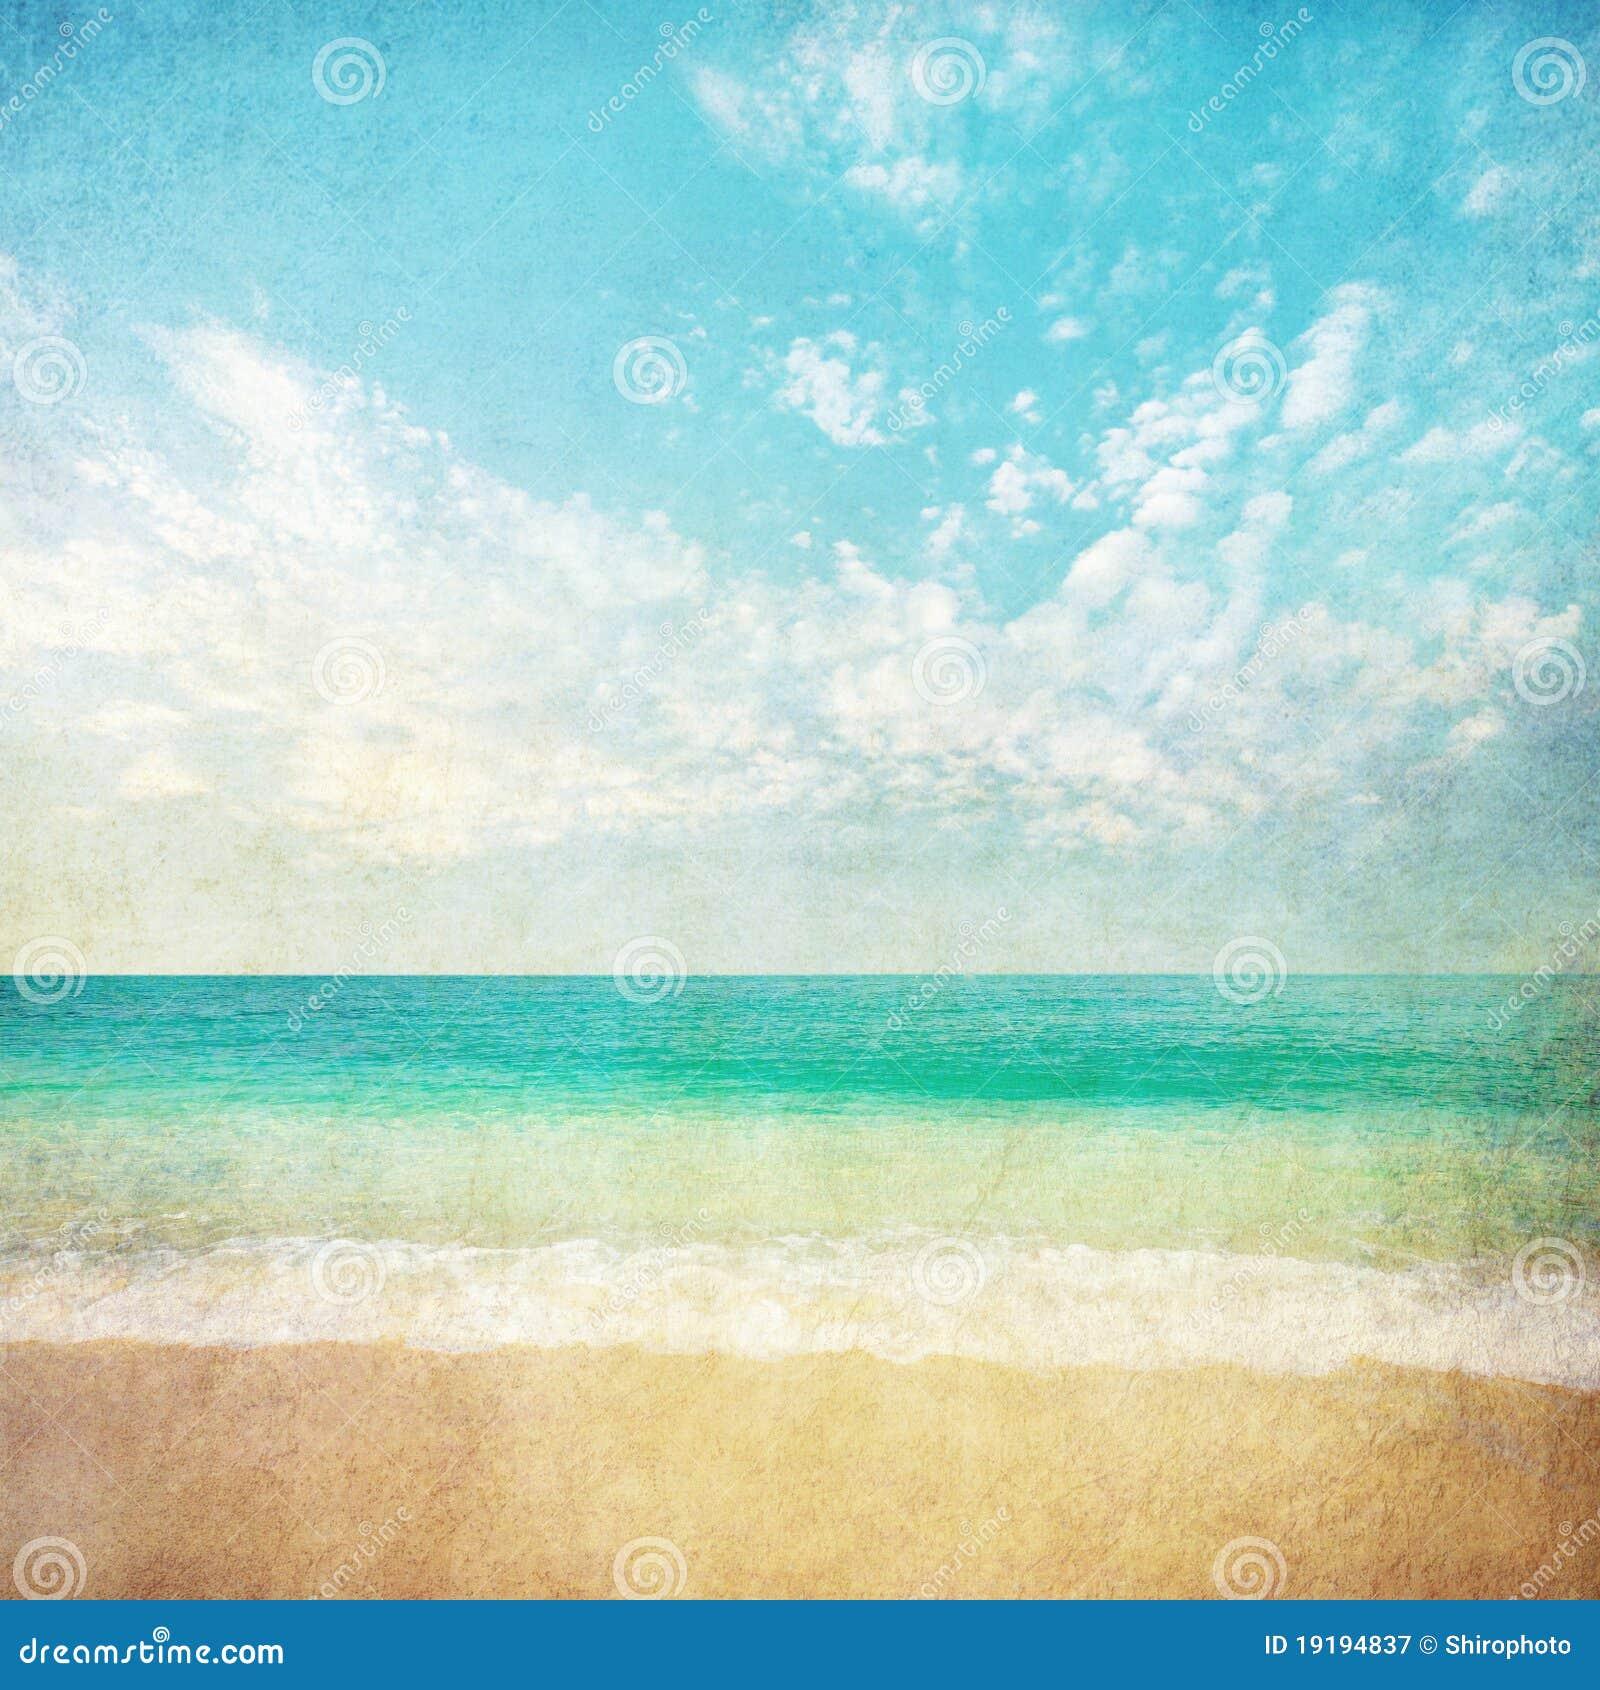 Grunge Sea Illustration Royalty Free Stock Photography